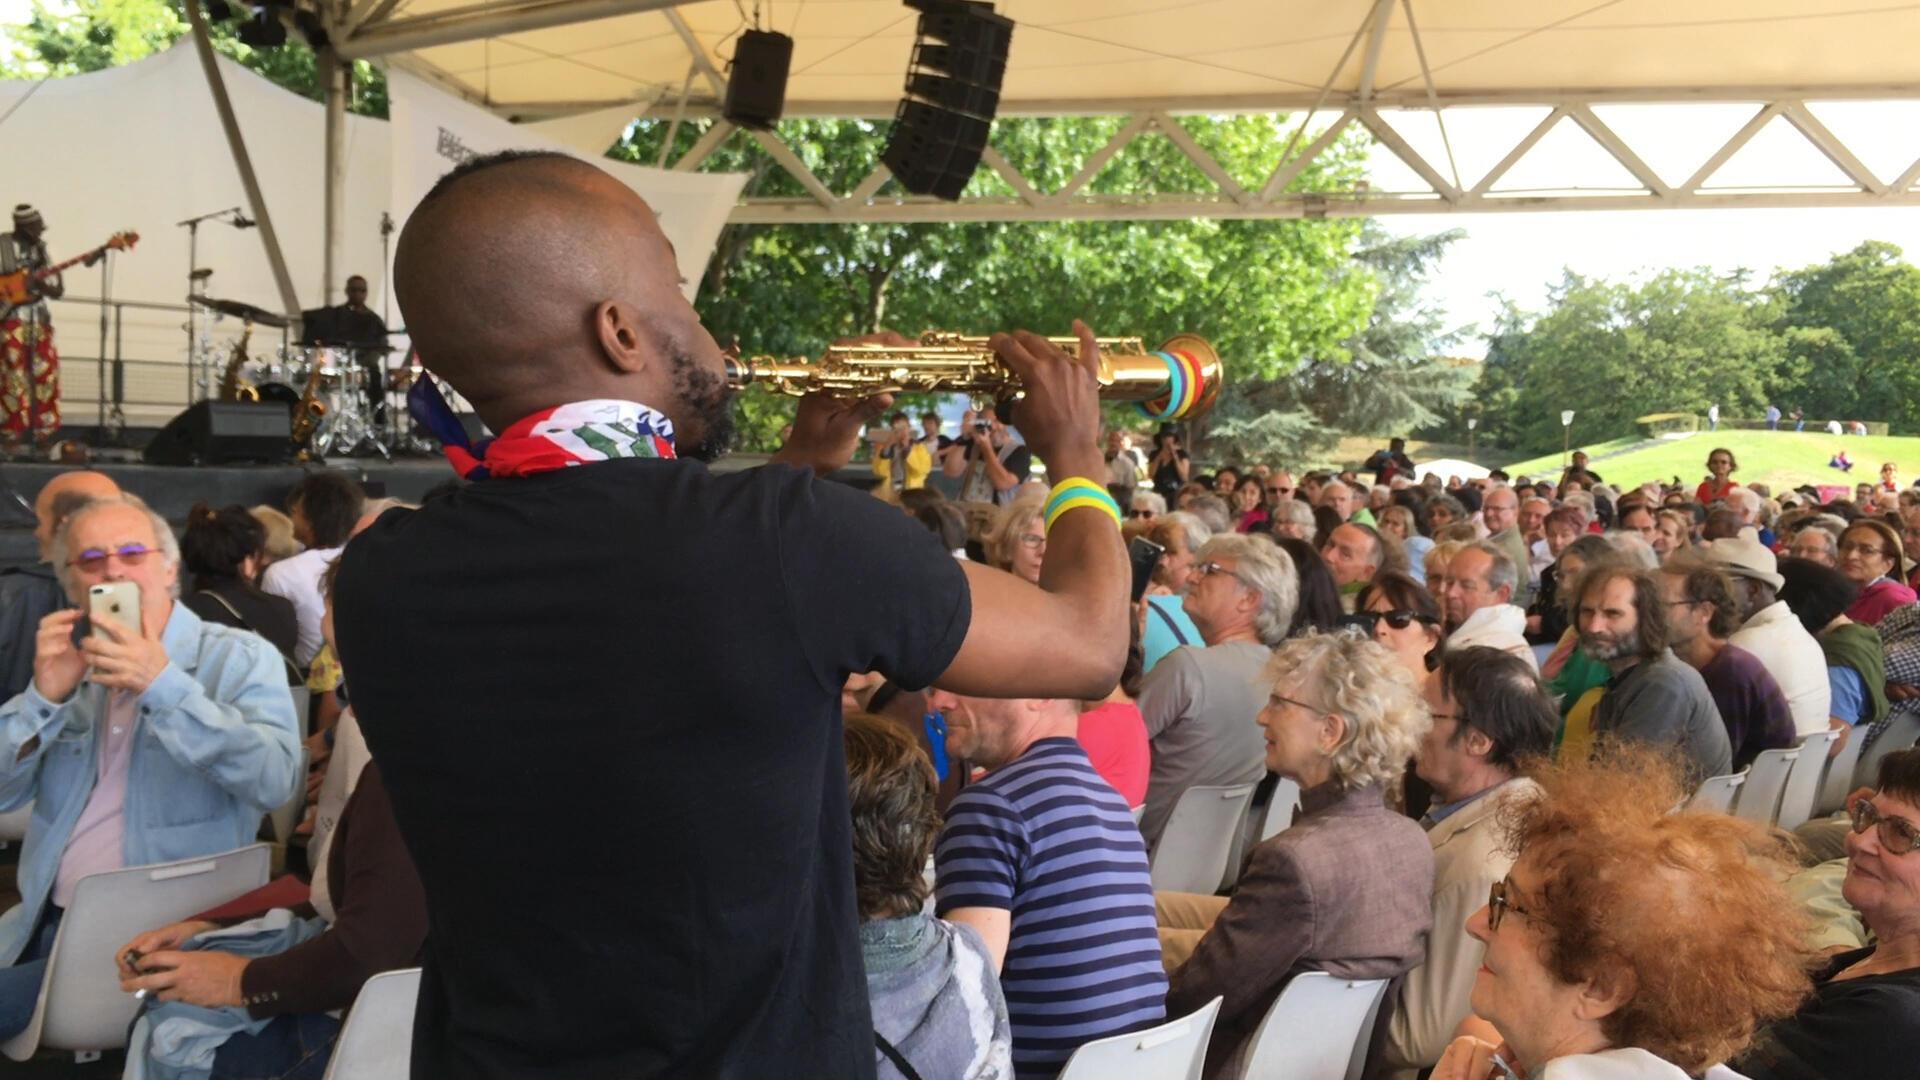 Jowee Omicil performs at the Paris Jazz Festival, Parc Floral, August 2019